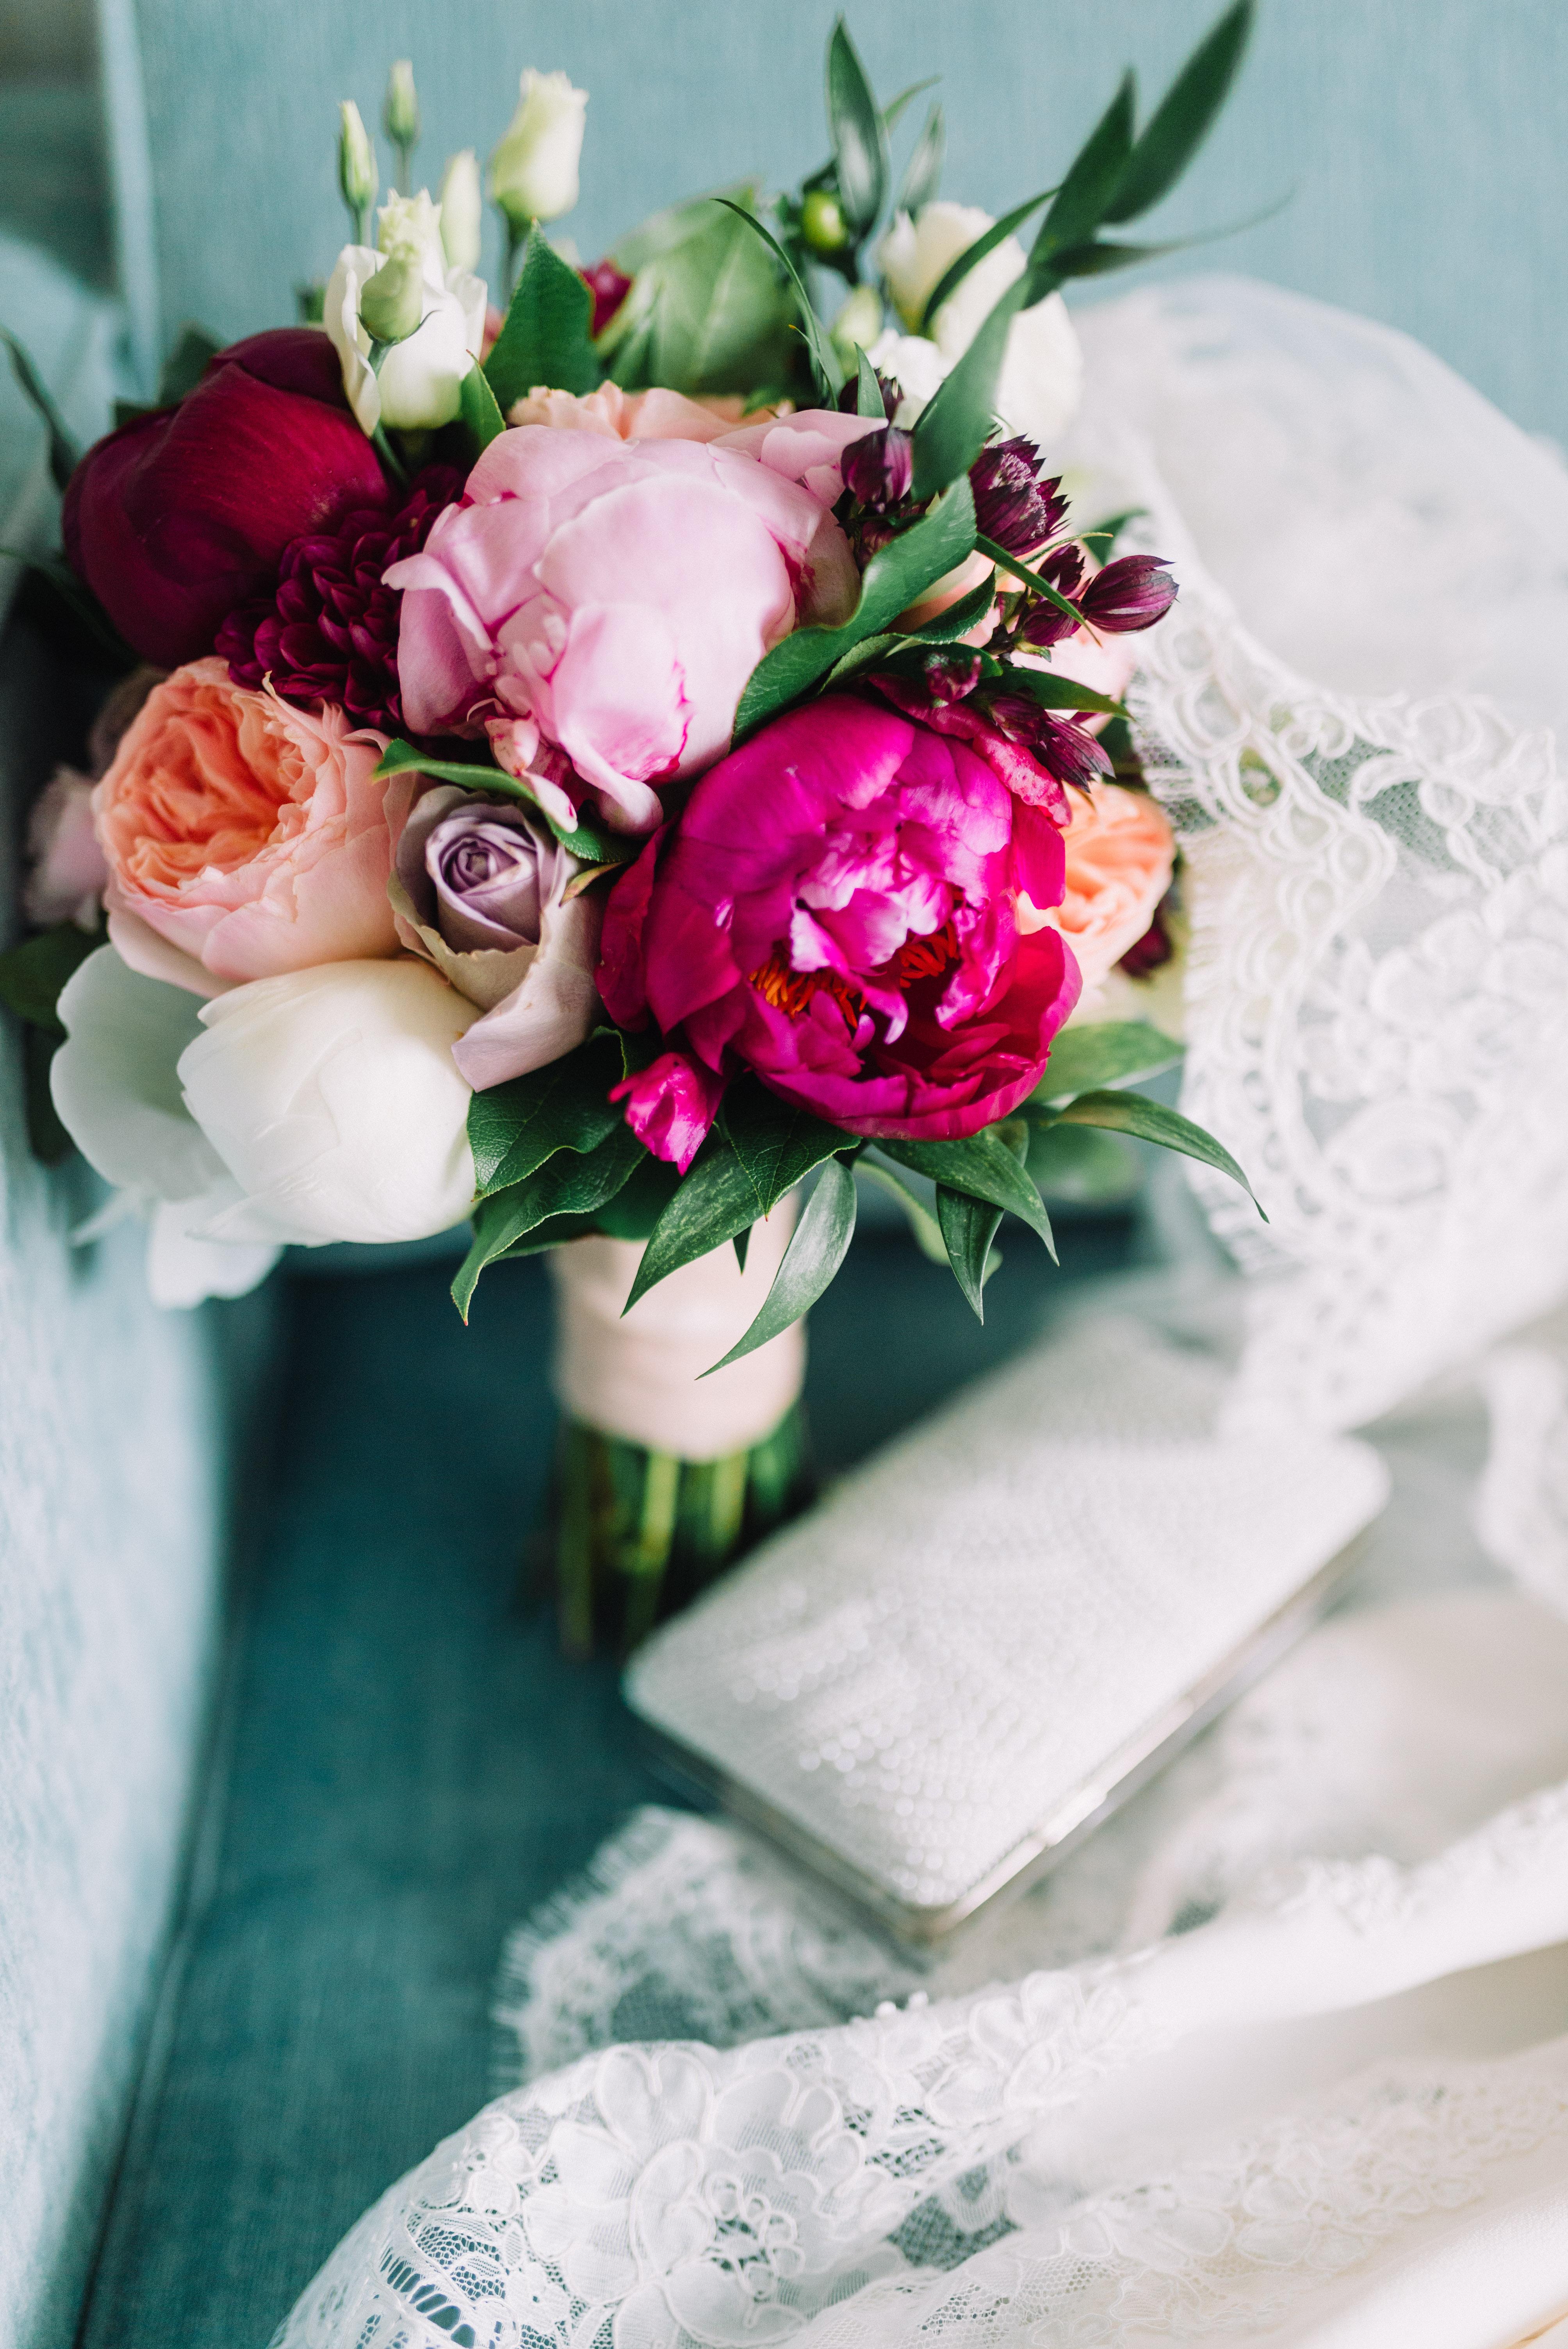 http://aimeedelalande.photography/